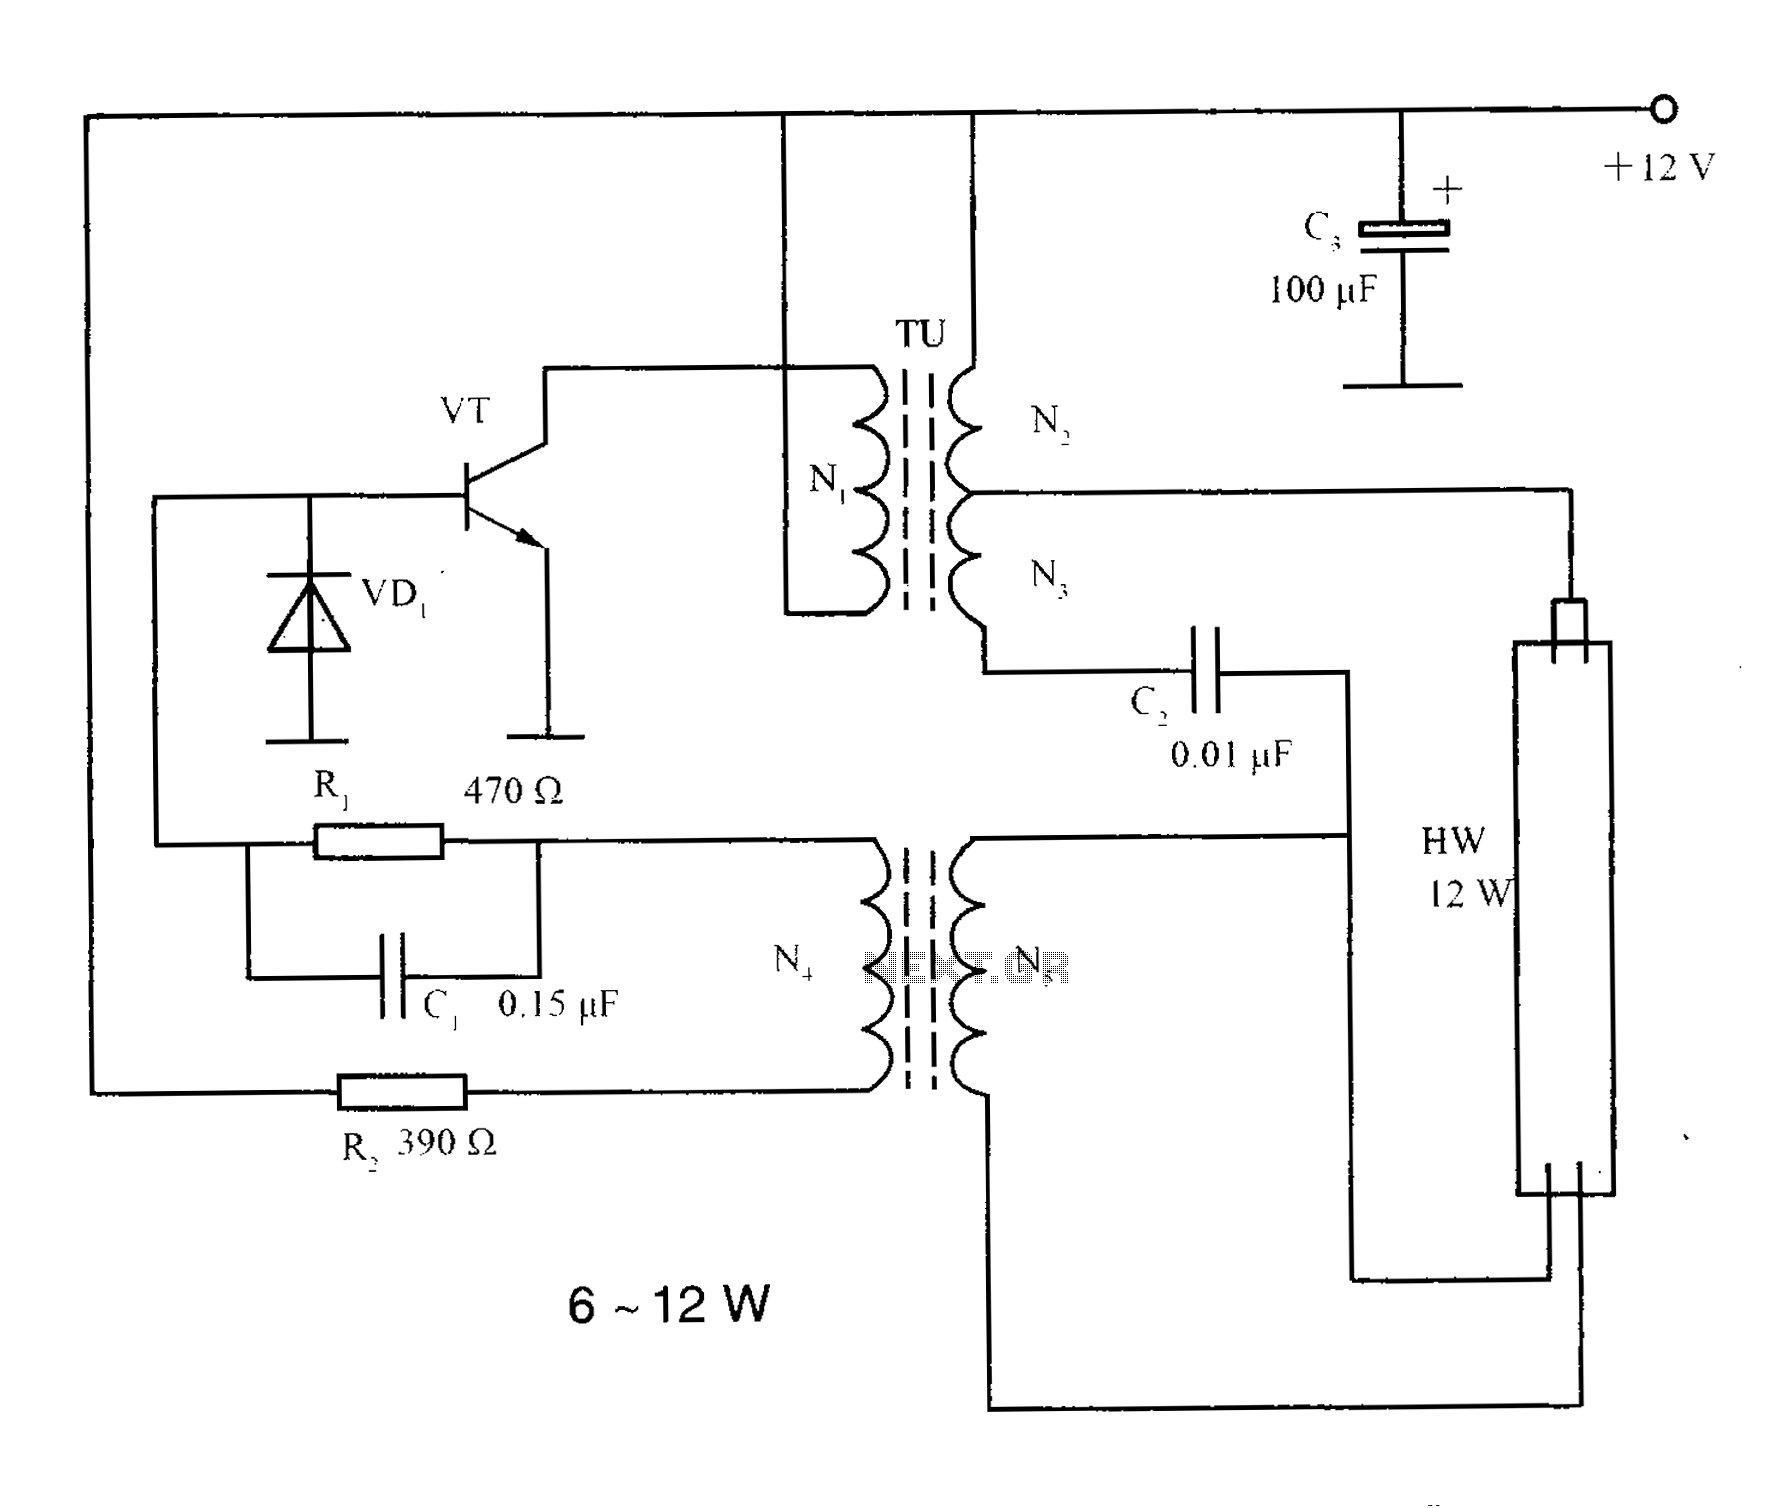 Touch Lamp Sensor Wiring Diagram   Wiring Library - Touch Lamp Sensor Wiring Diagram